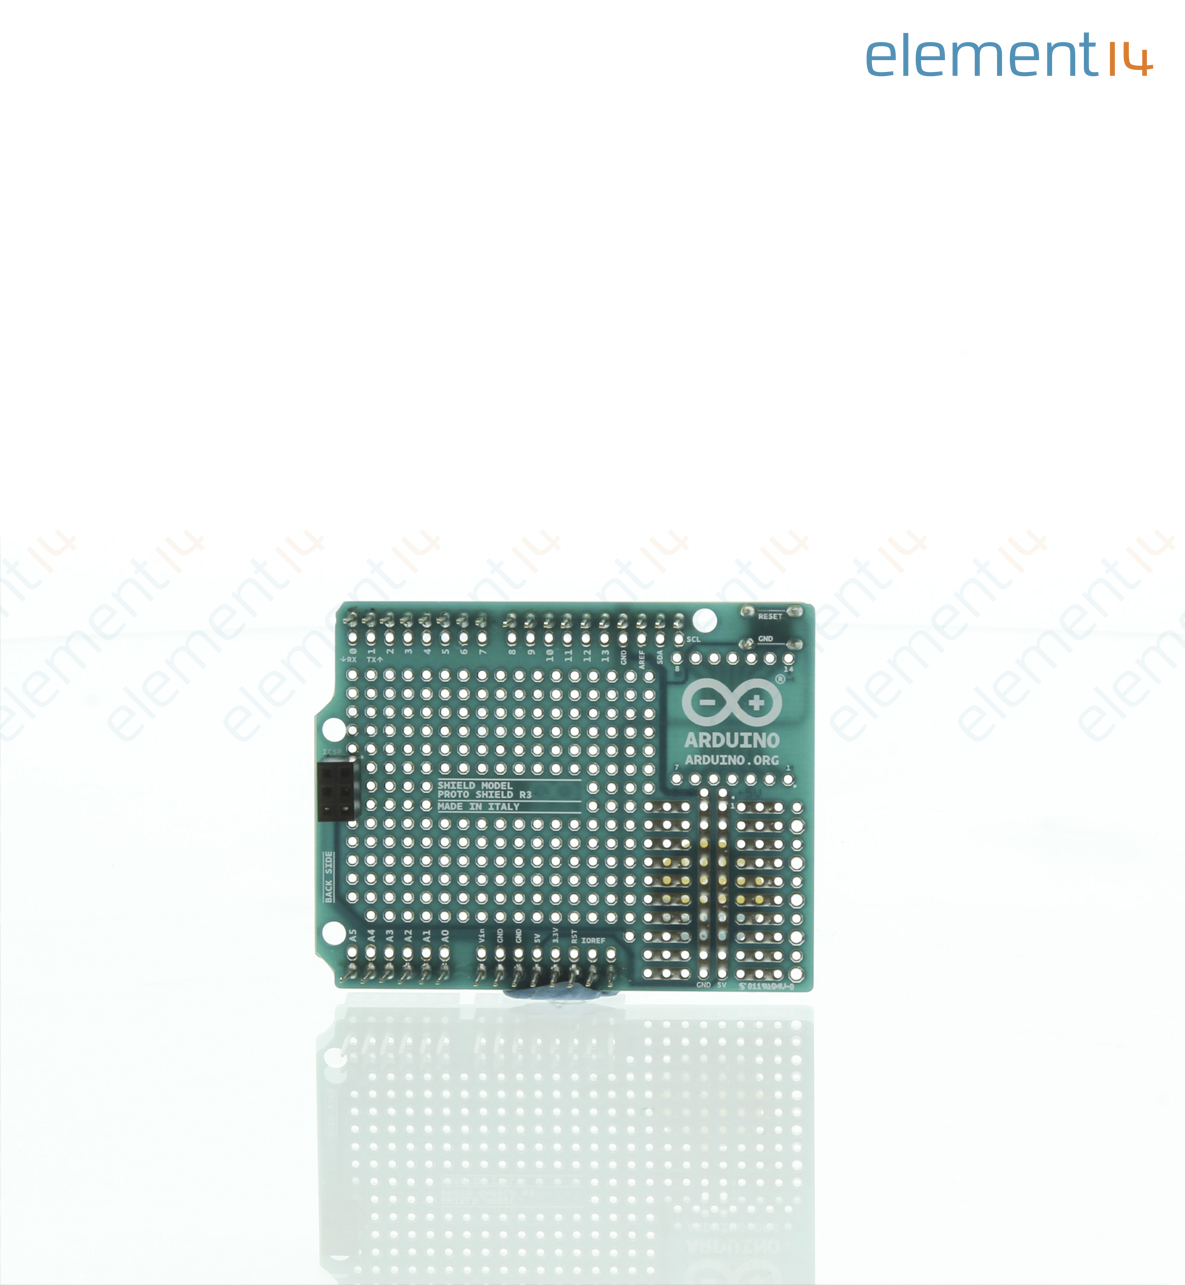 A000077 Arduino Daughter Board Prototype Shield 10 Circuit Prototypes Richmedia 2700b En